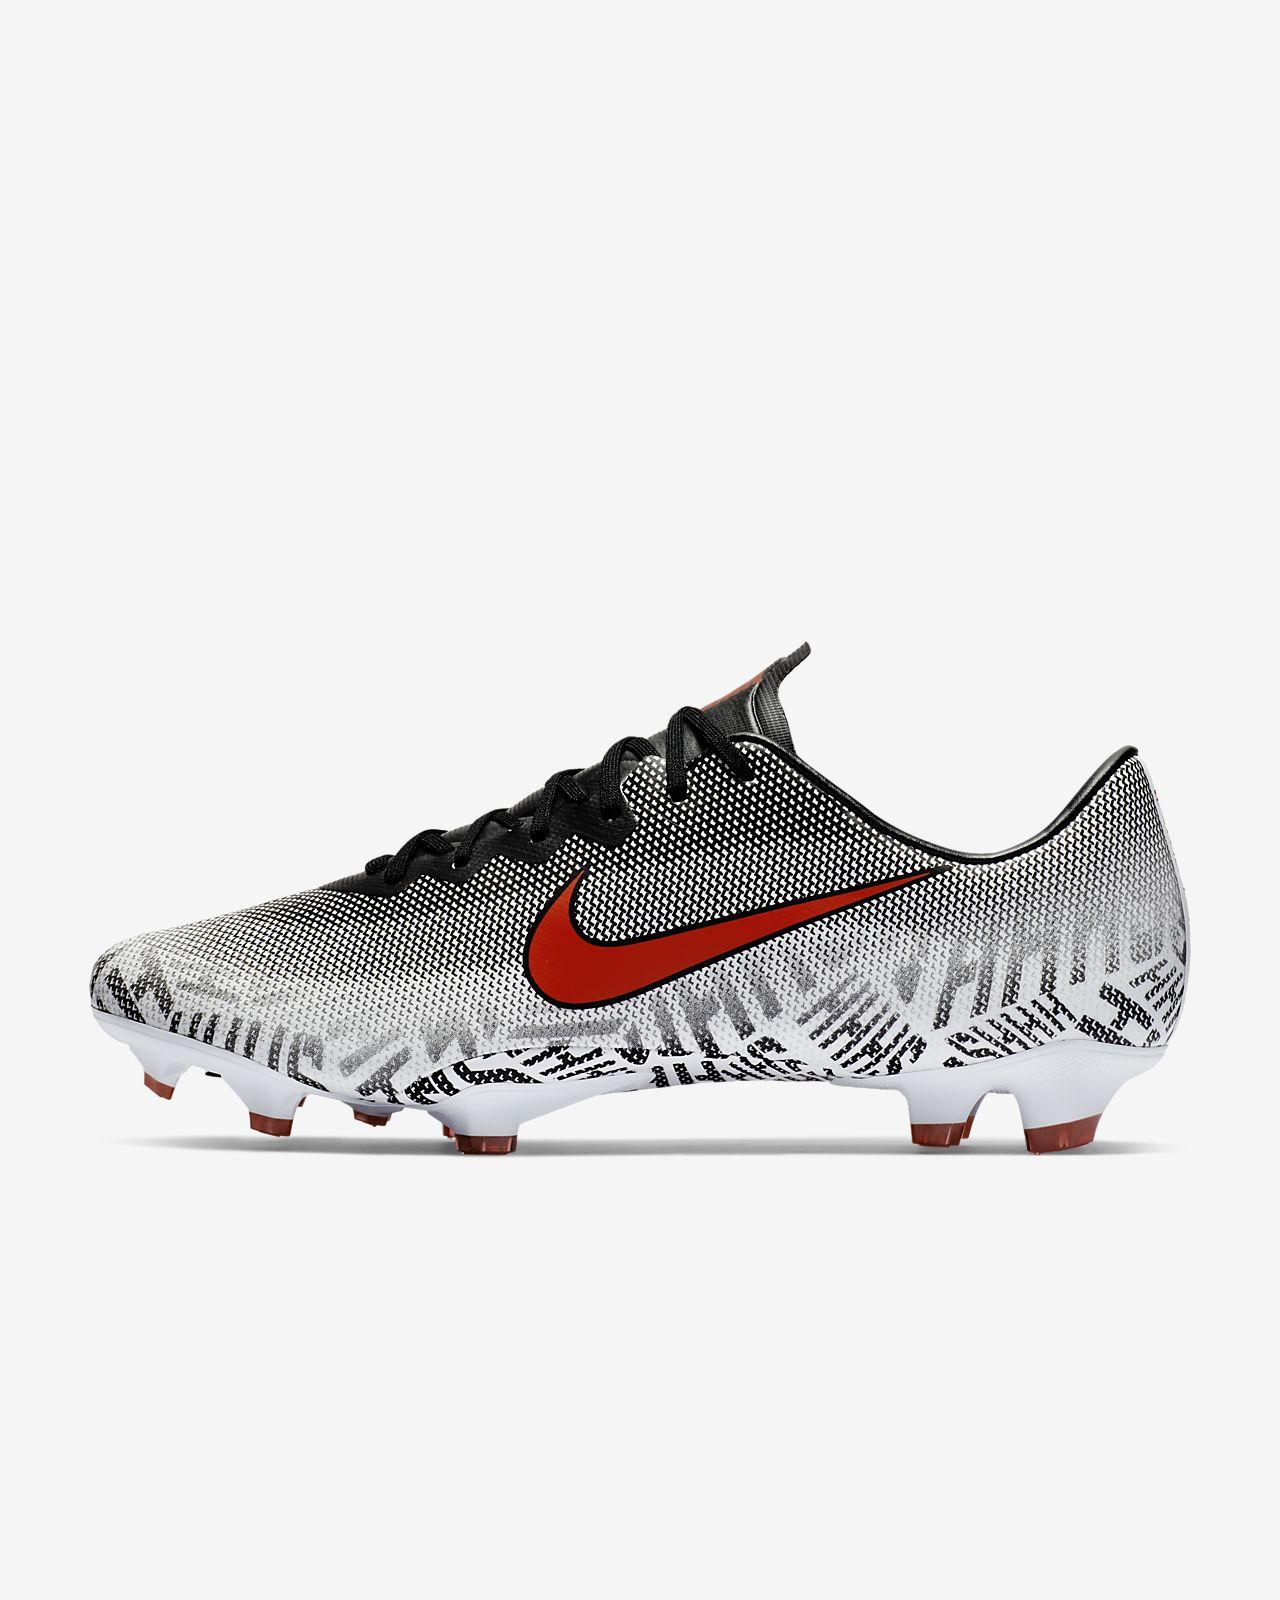 5ce438462882d ... Nike Mercurial Vapor XII Pro Neymar Jr Botas de fútbol para terreno  firme - Hombre